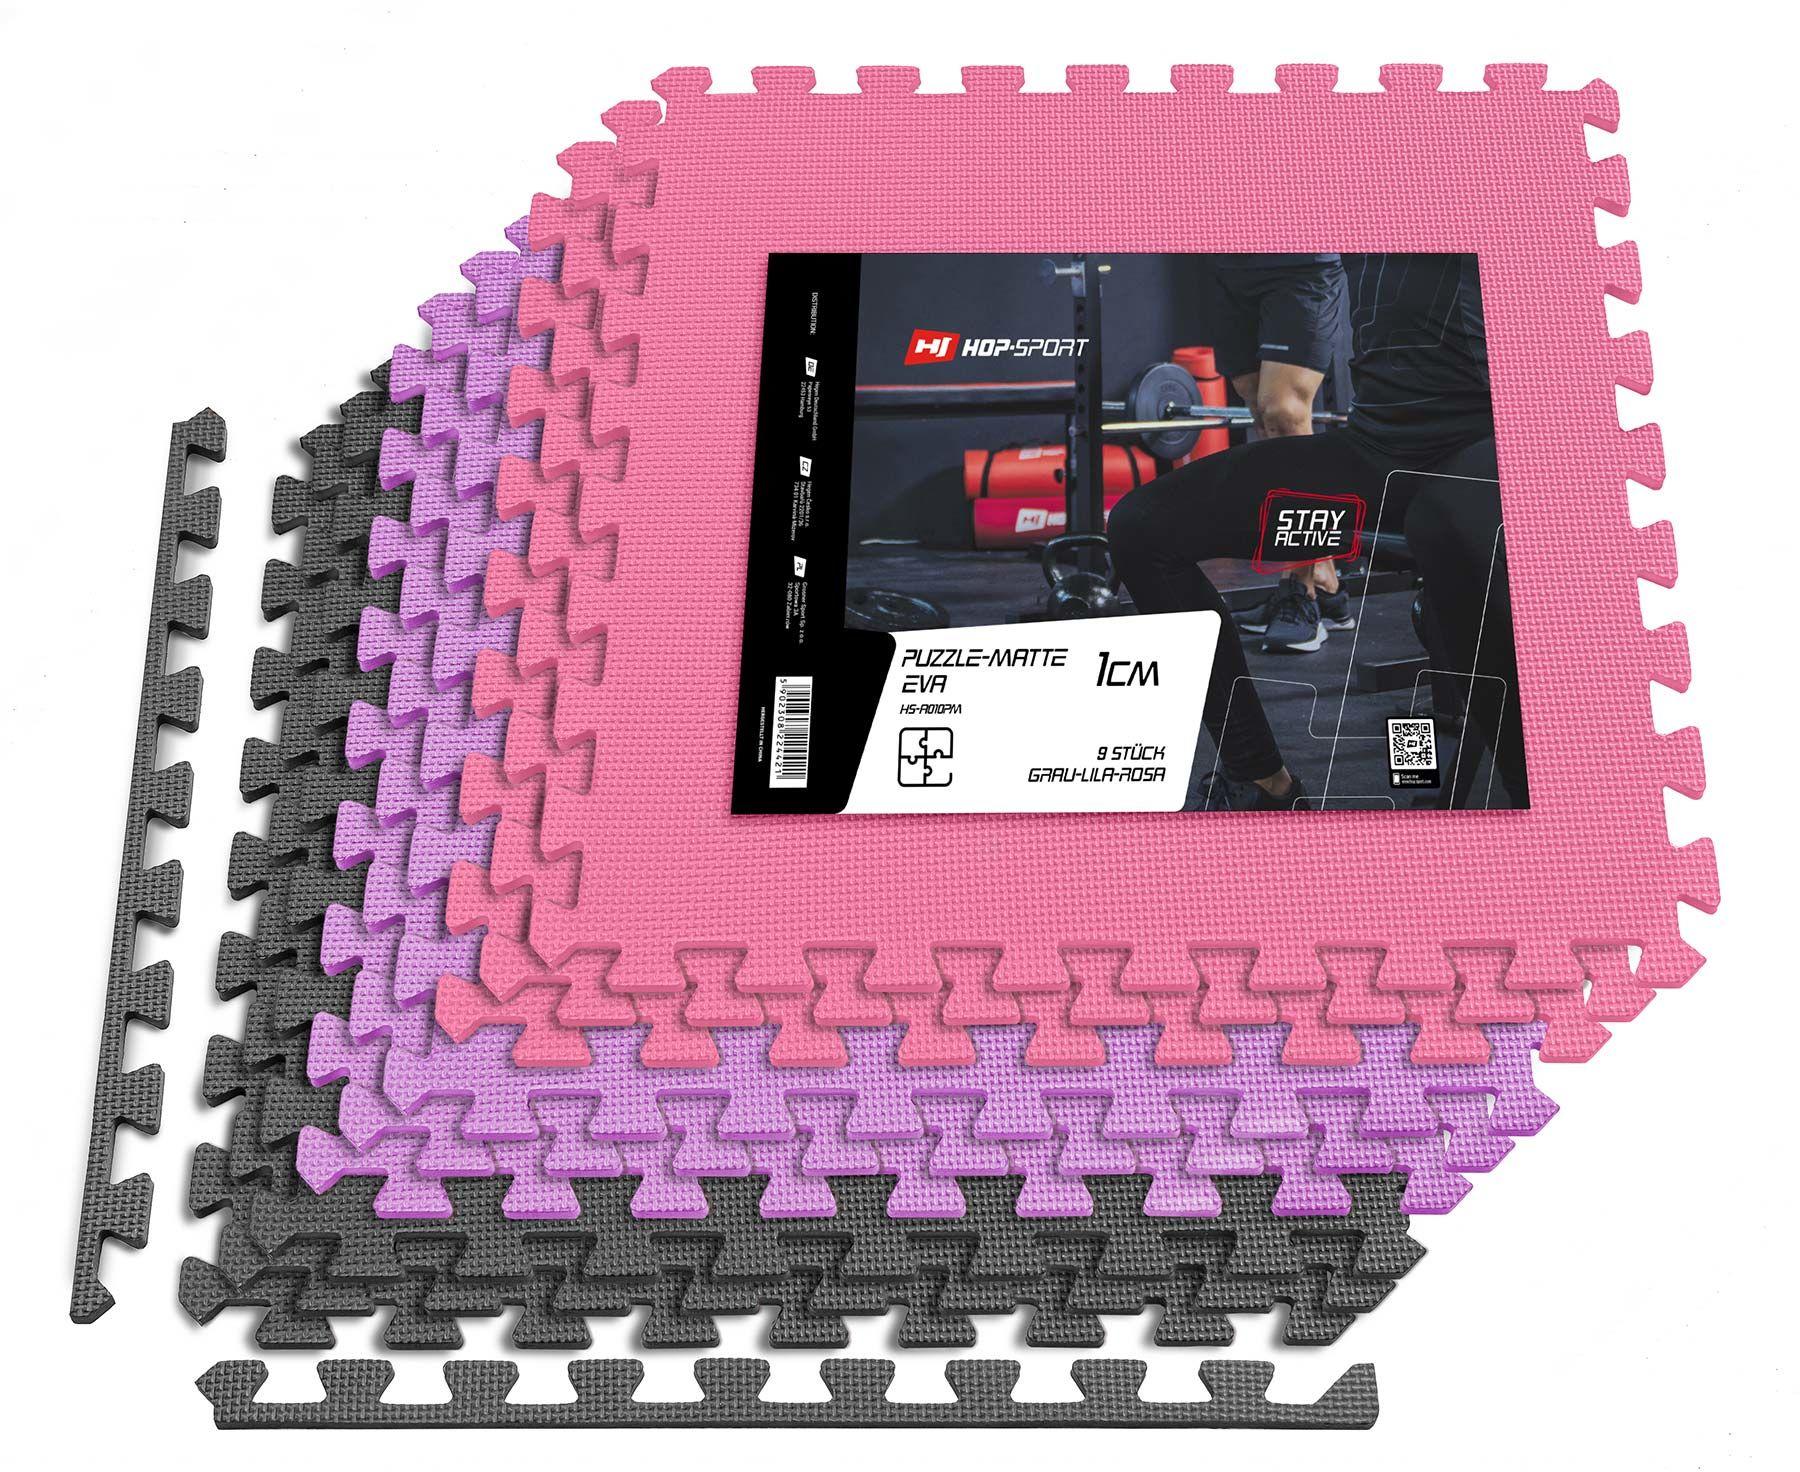 Mata puzzle EVA 1cm szaro/fioletowo/różowa - 9 sztuk